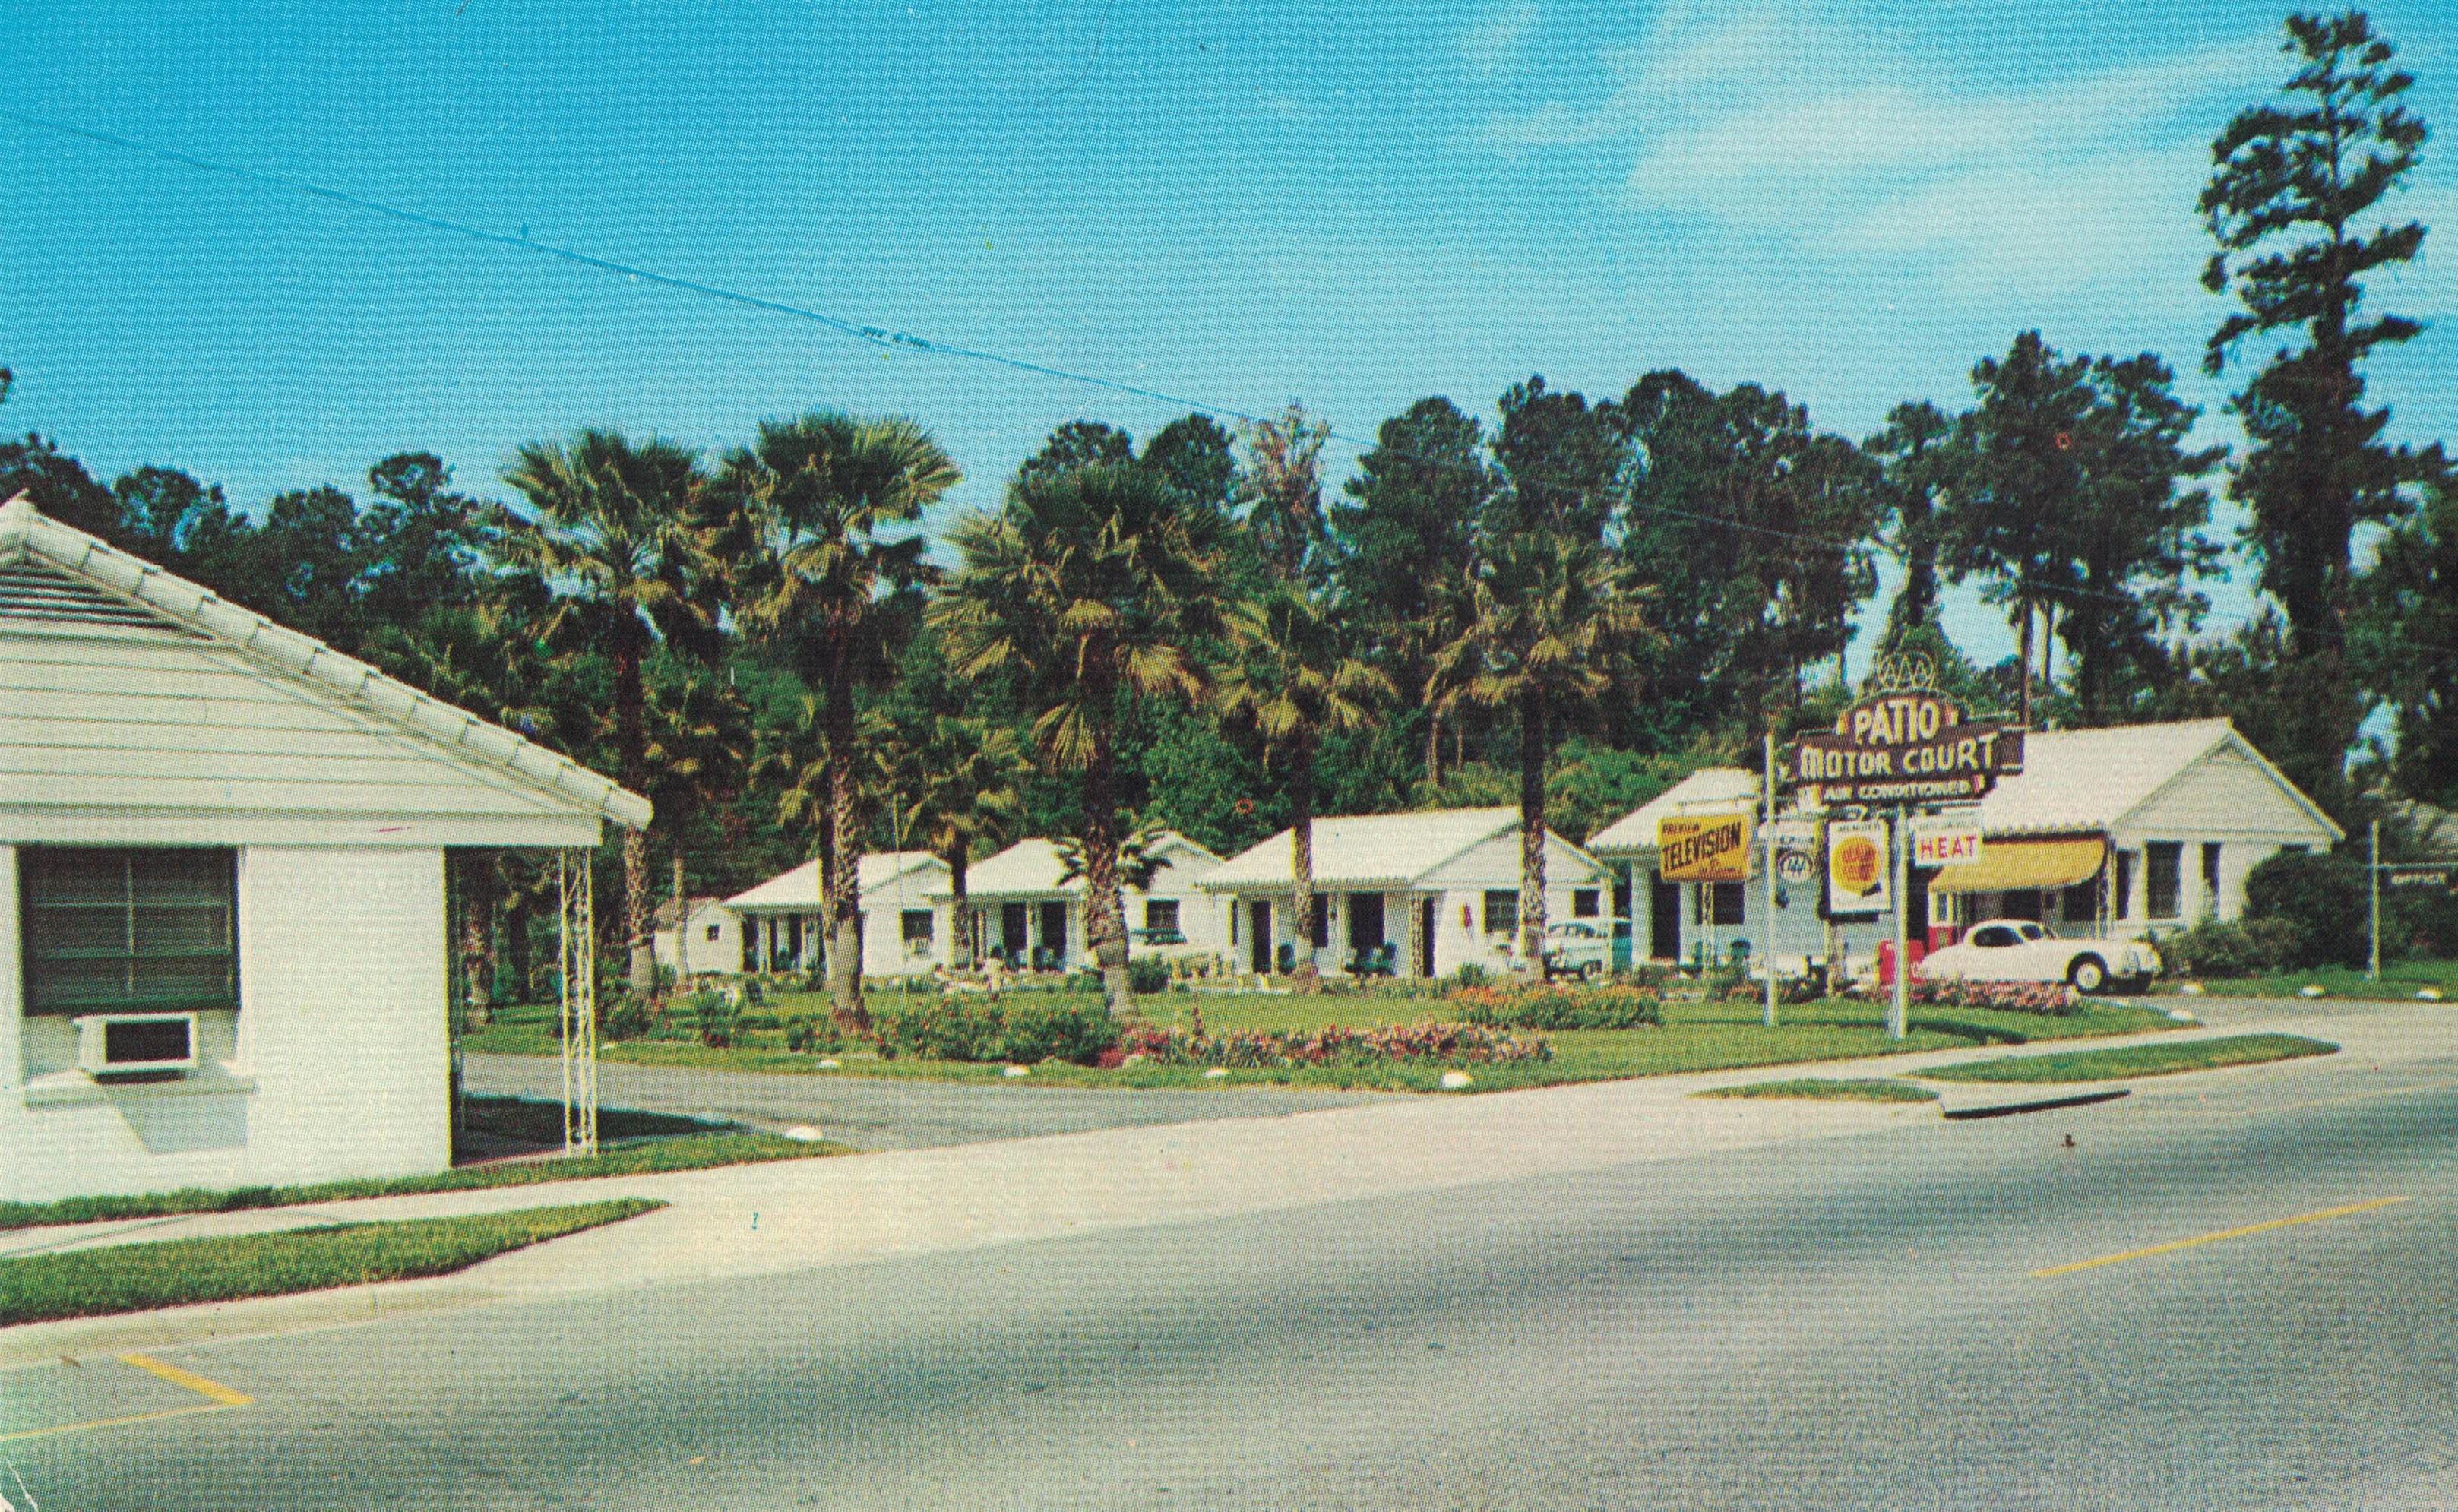 E. Ben Walton Jr. Built Mount Vernon Motor Lodges In Miami, West Palm  Beach, Daytona, And Jacksonville. In 1941, Heu0027d Built The Heart Of Palm  Beach Hotel ...